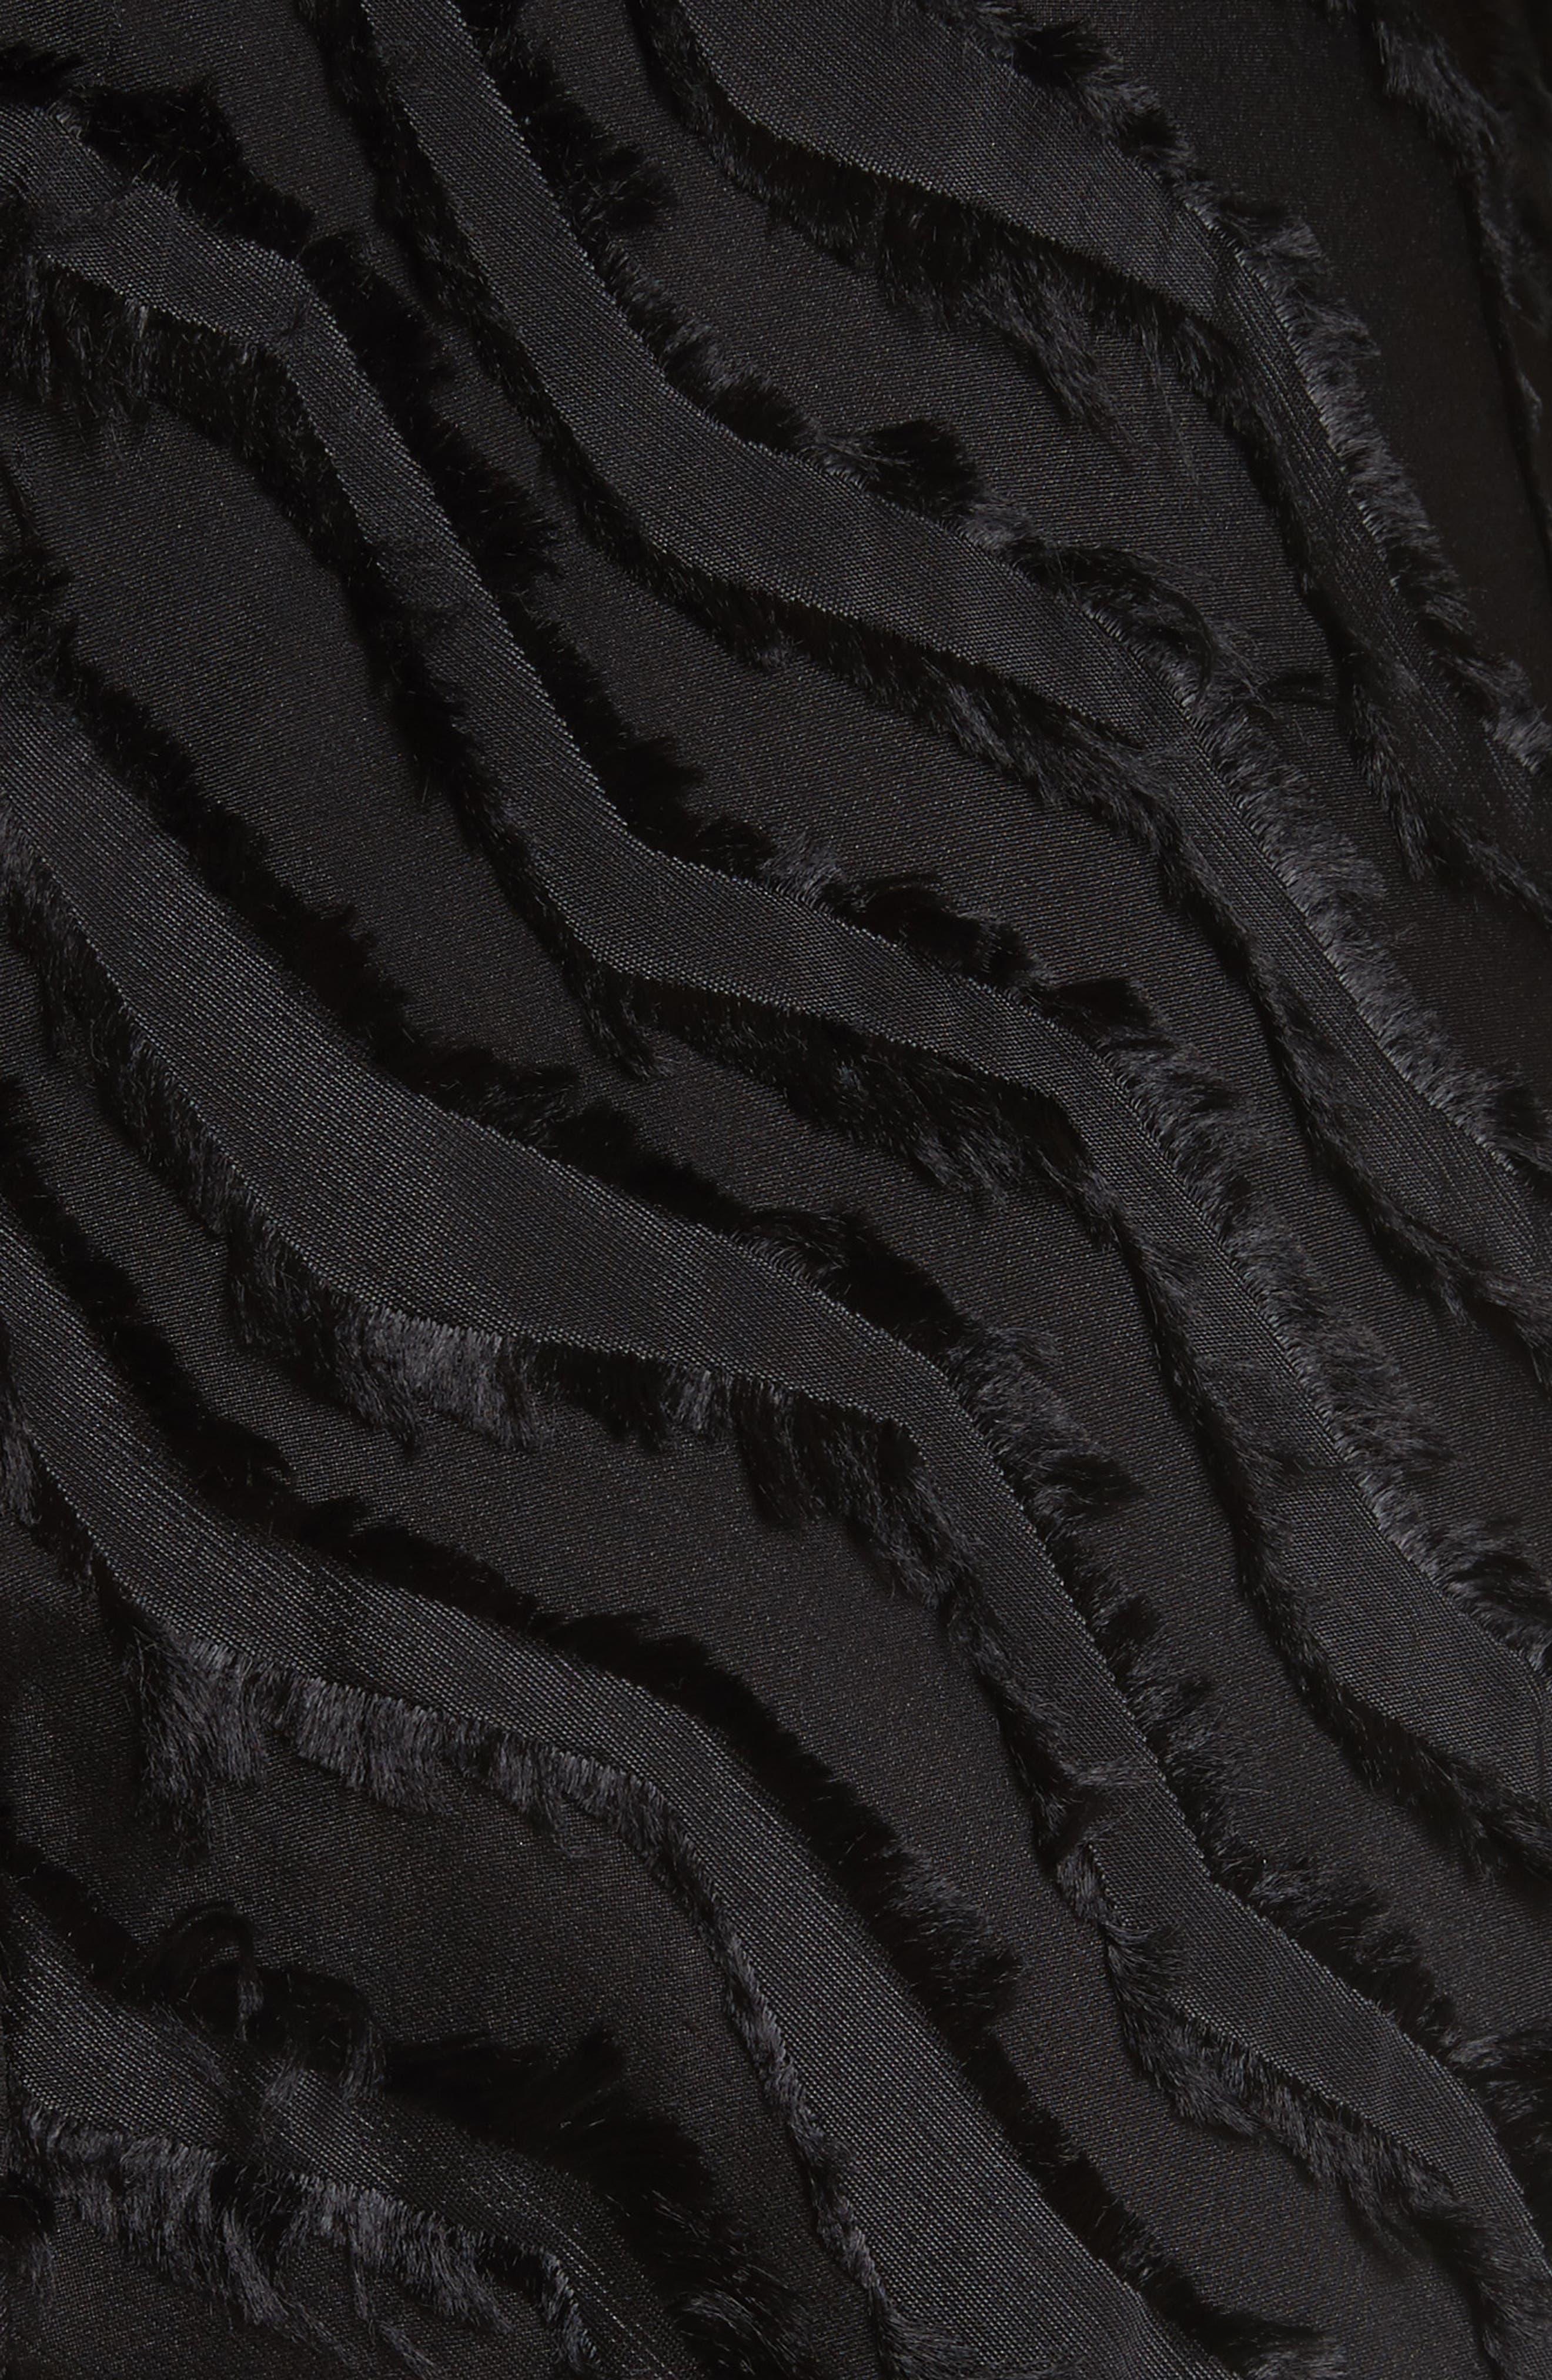 Chevron Fringe Fil Coupé Dress,                             Alternate thumbnail 5, color,                             001